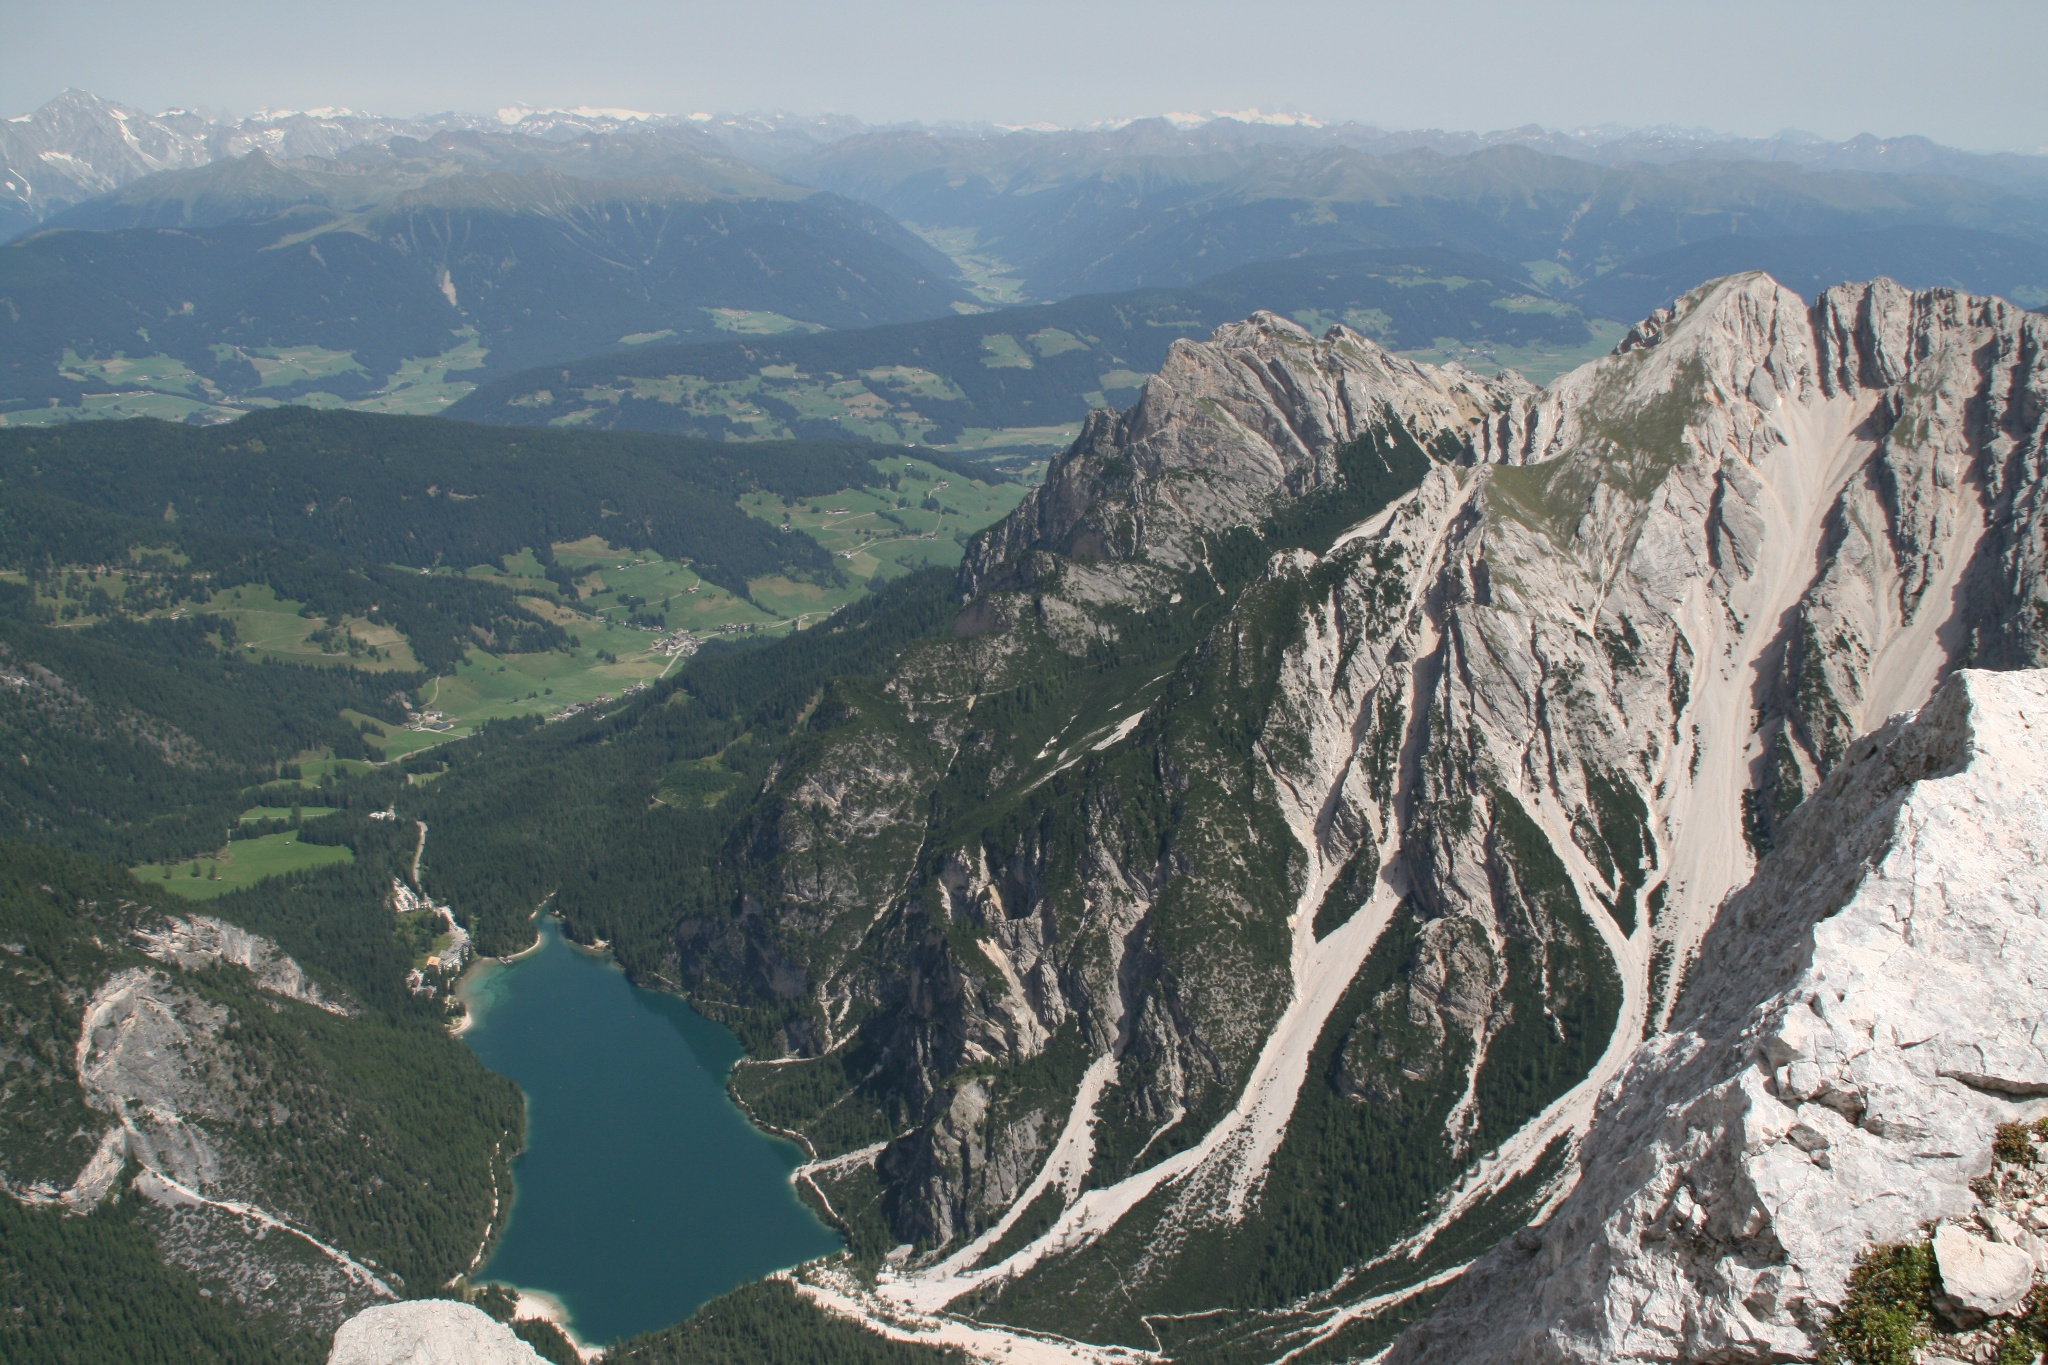 Herrstein, Pragser Wildsee, Seekofl, Gamsscharte